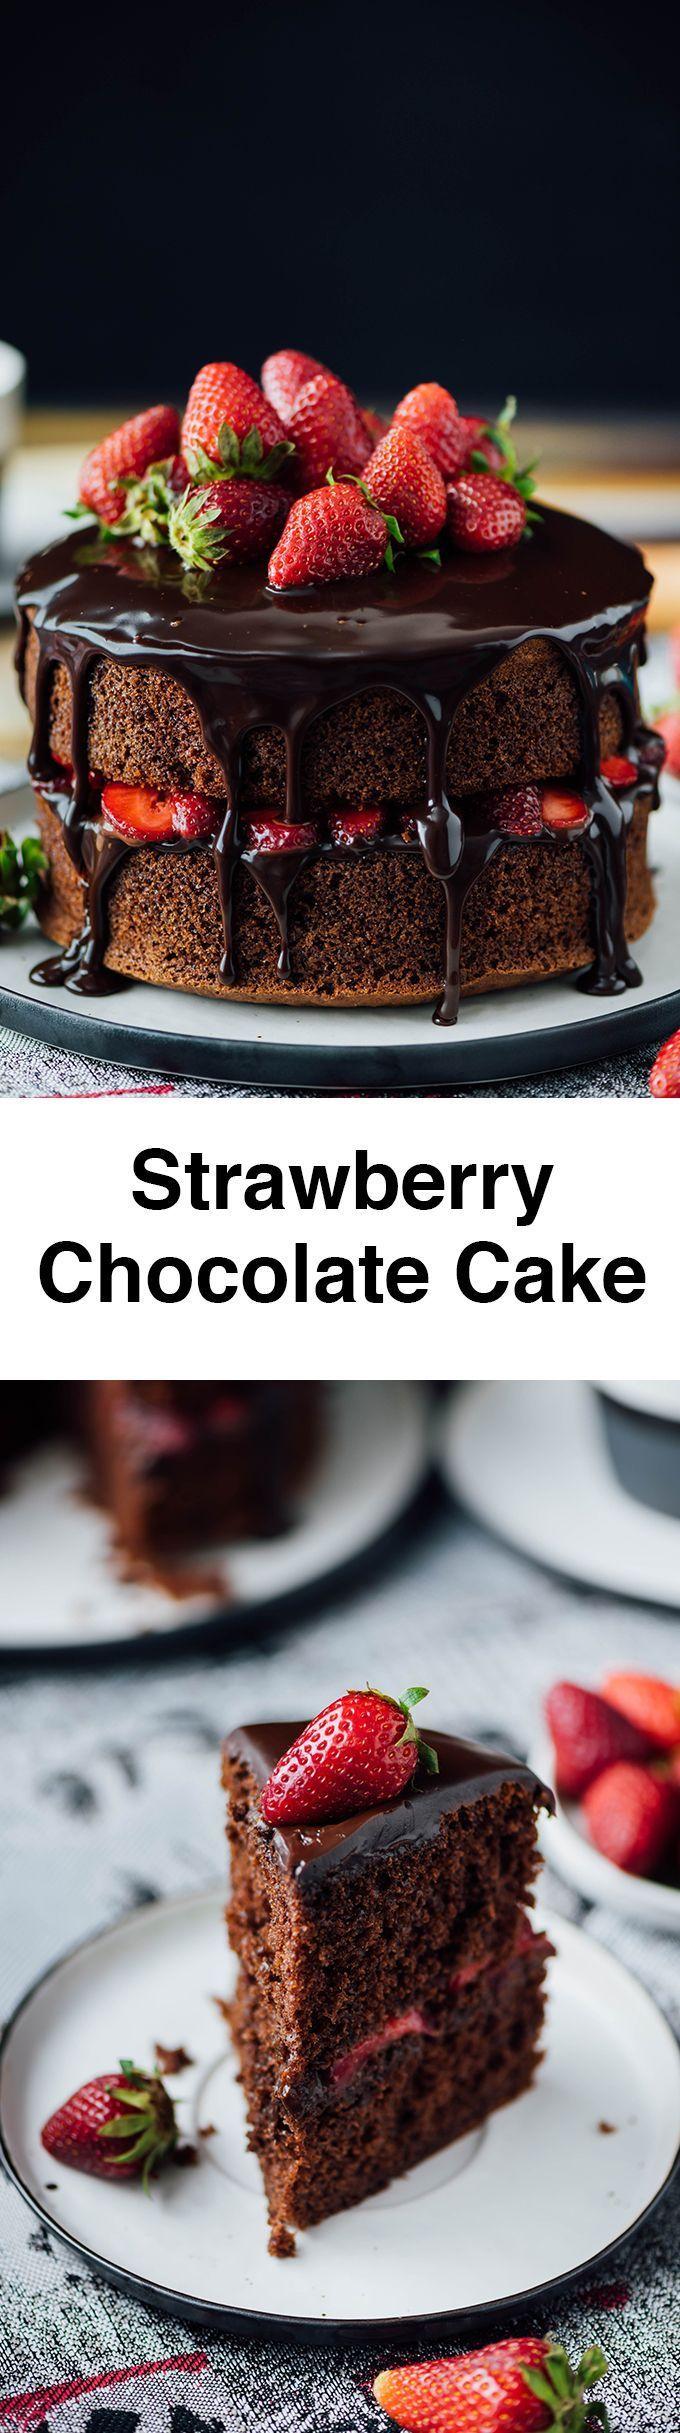 Best 20+ Strawberry chocolate cakes ideas on Pinterest | Chocolate ...